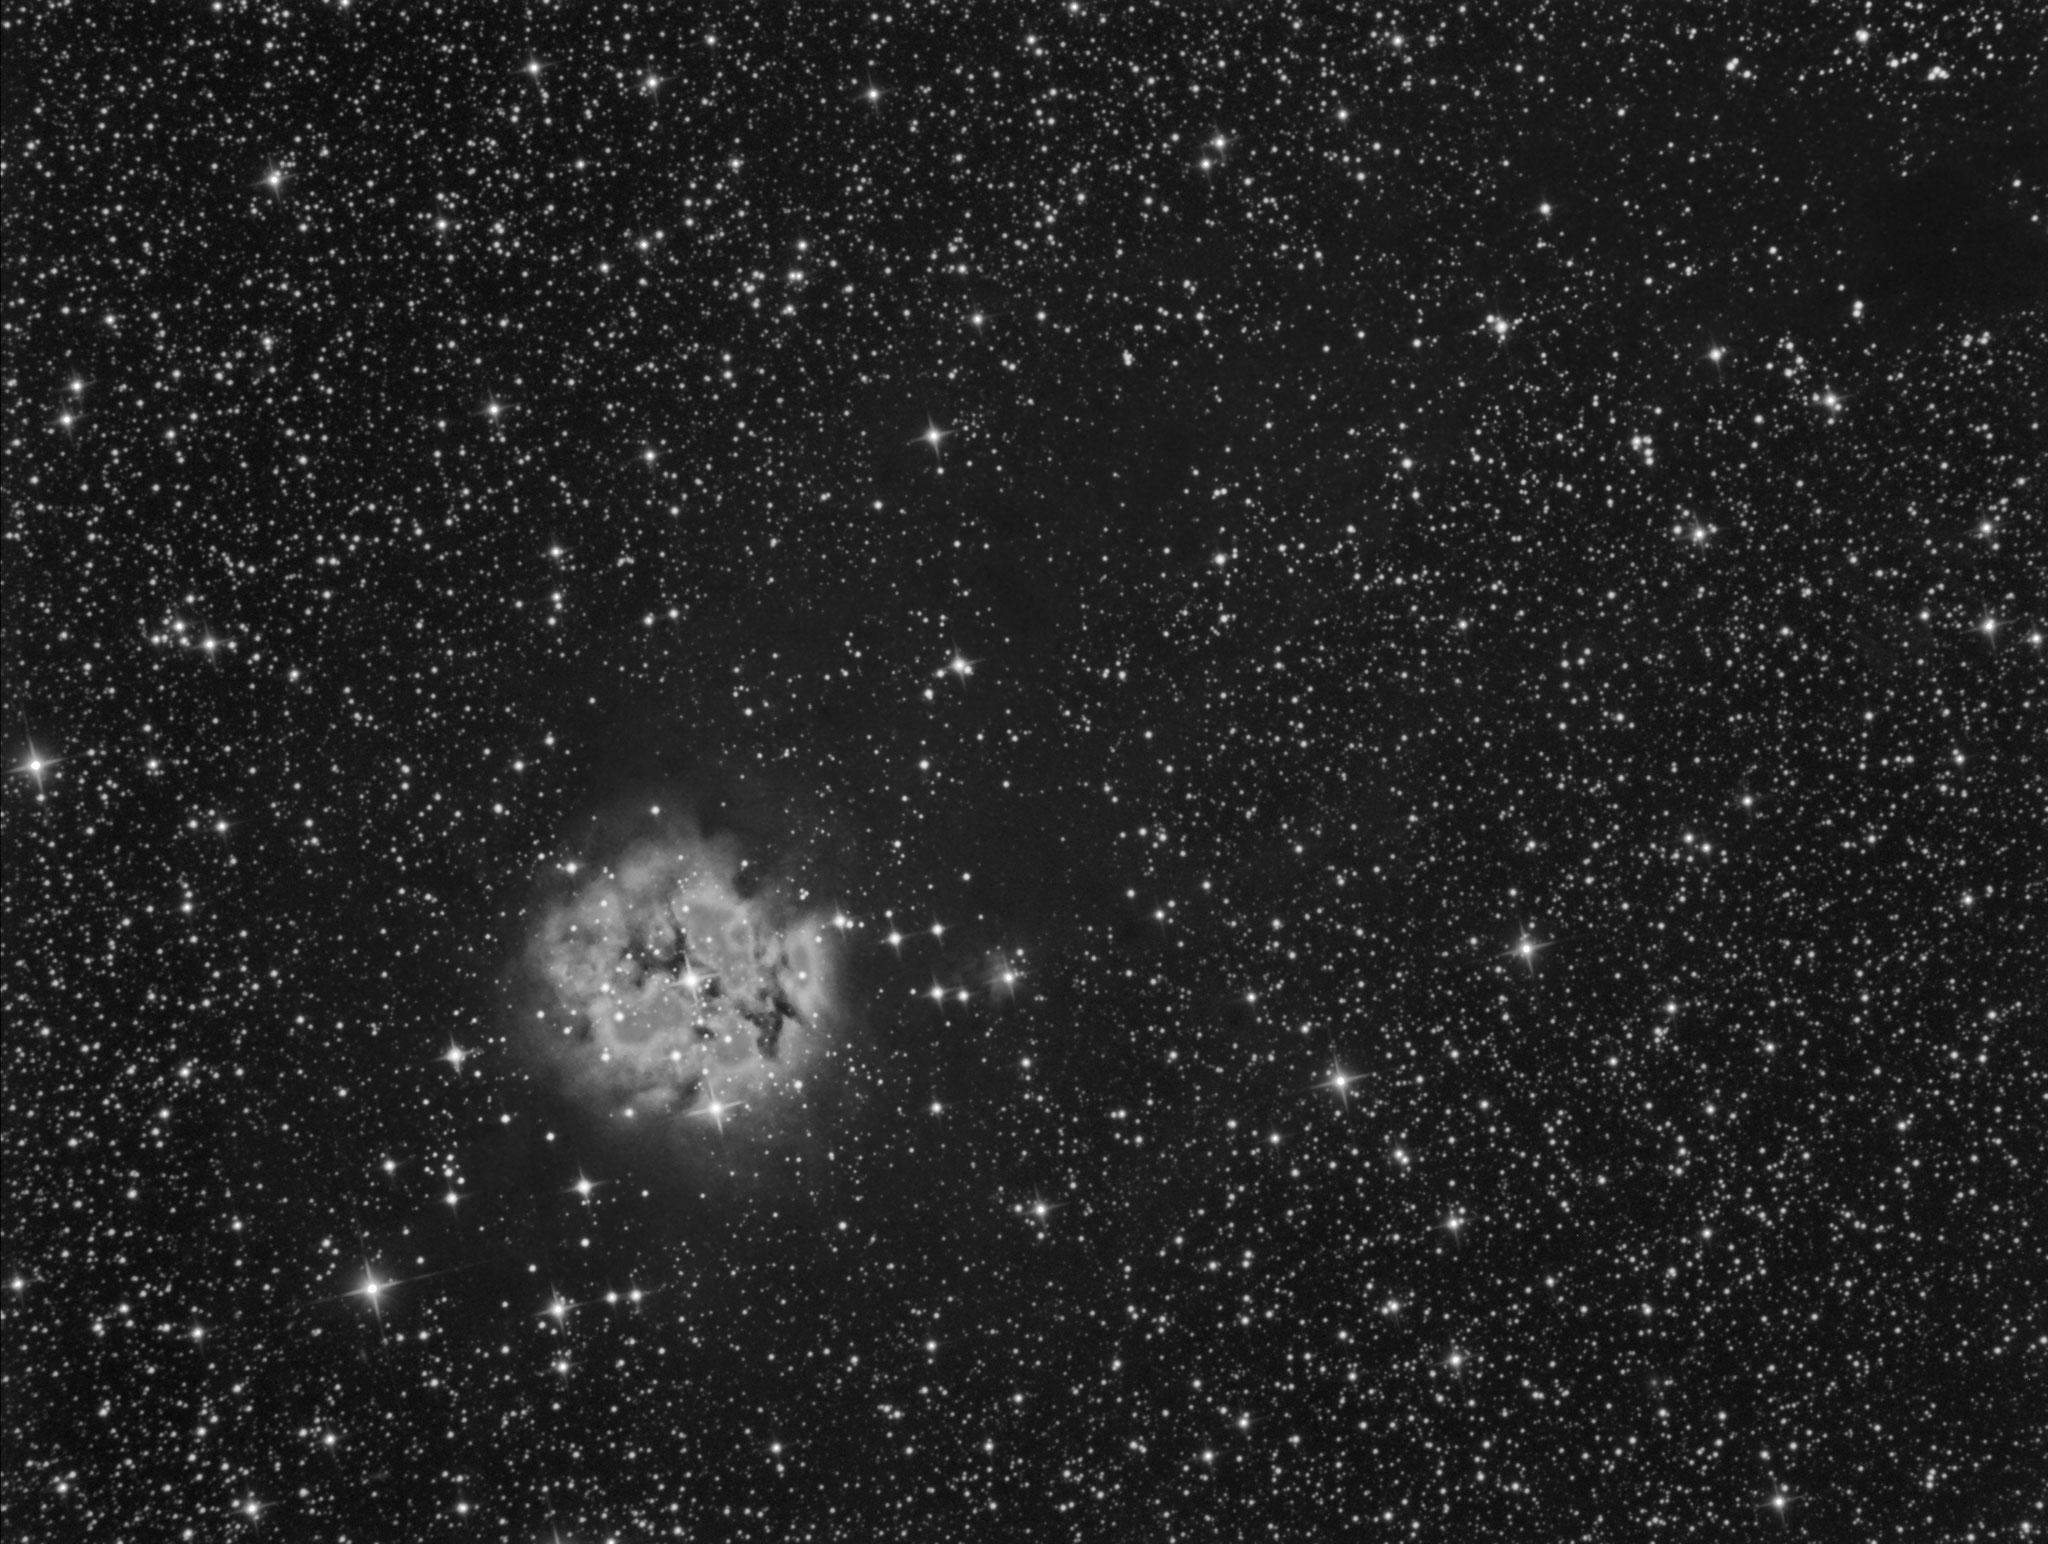 IC5146, 6x300s en luminance, image de test, 25 août 2016